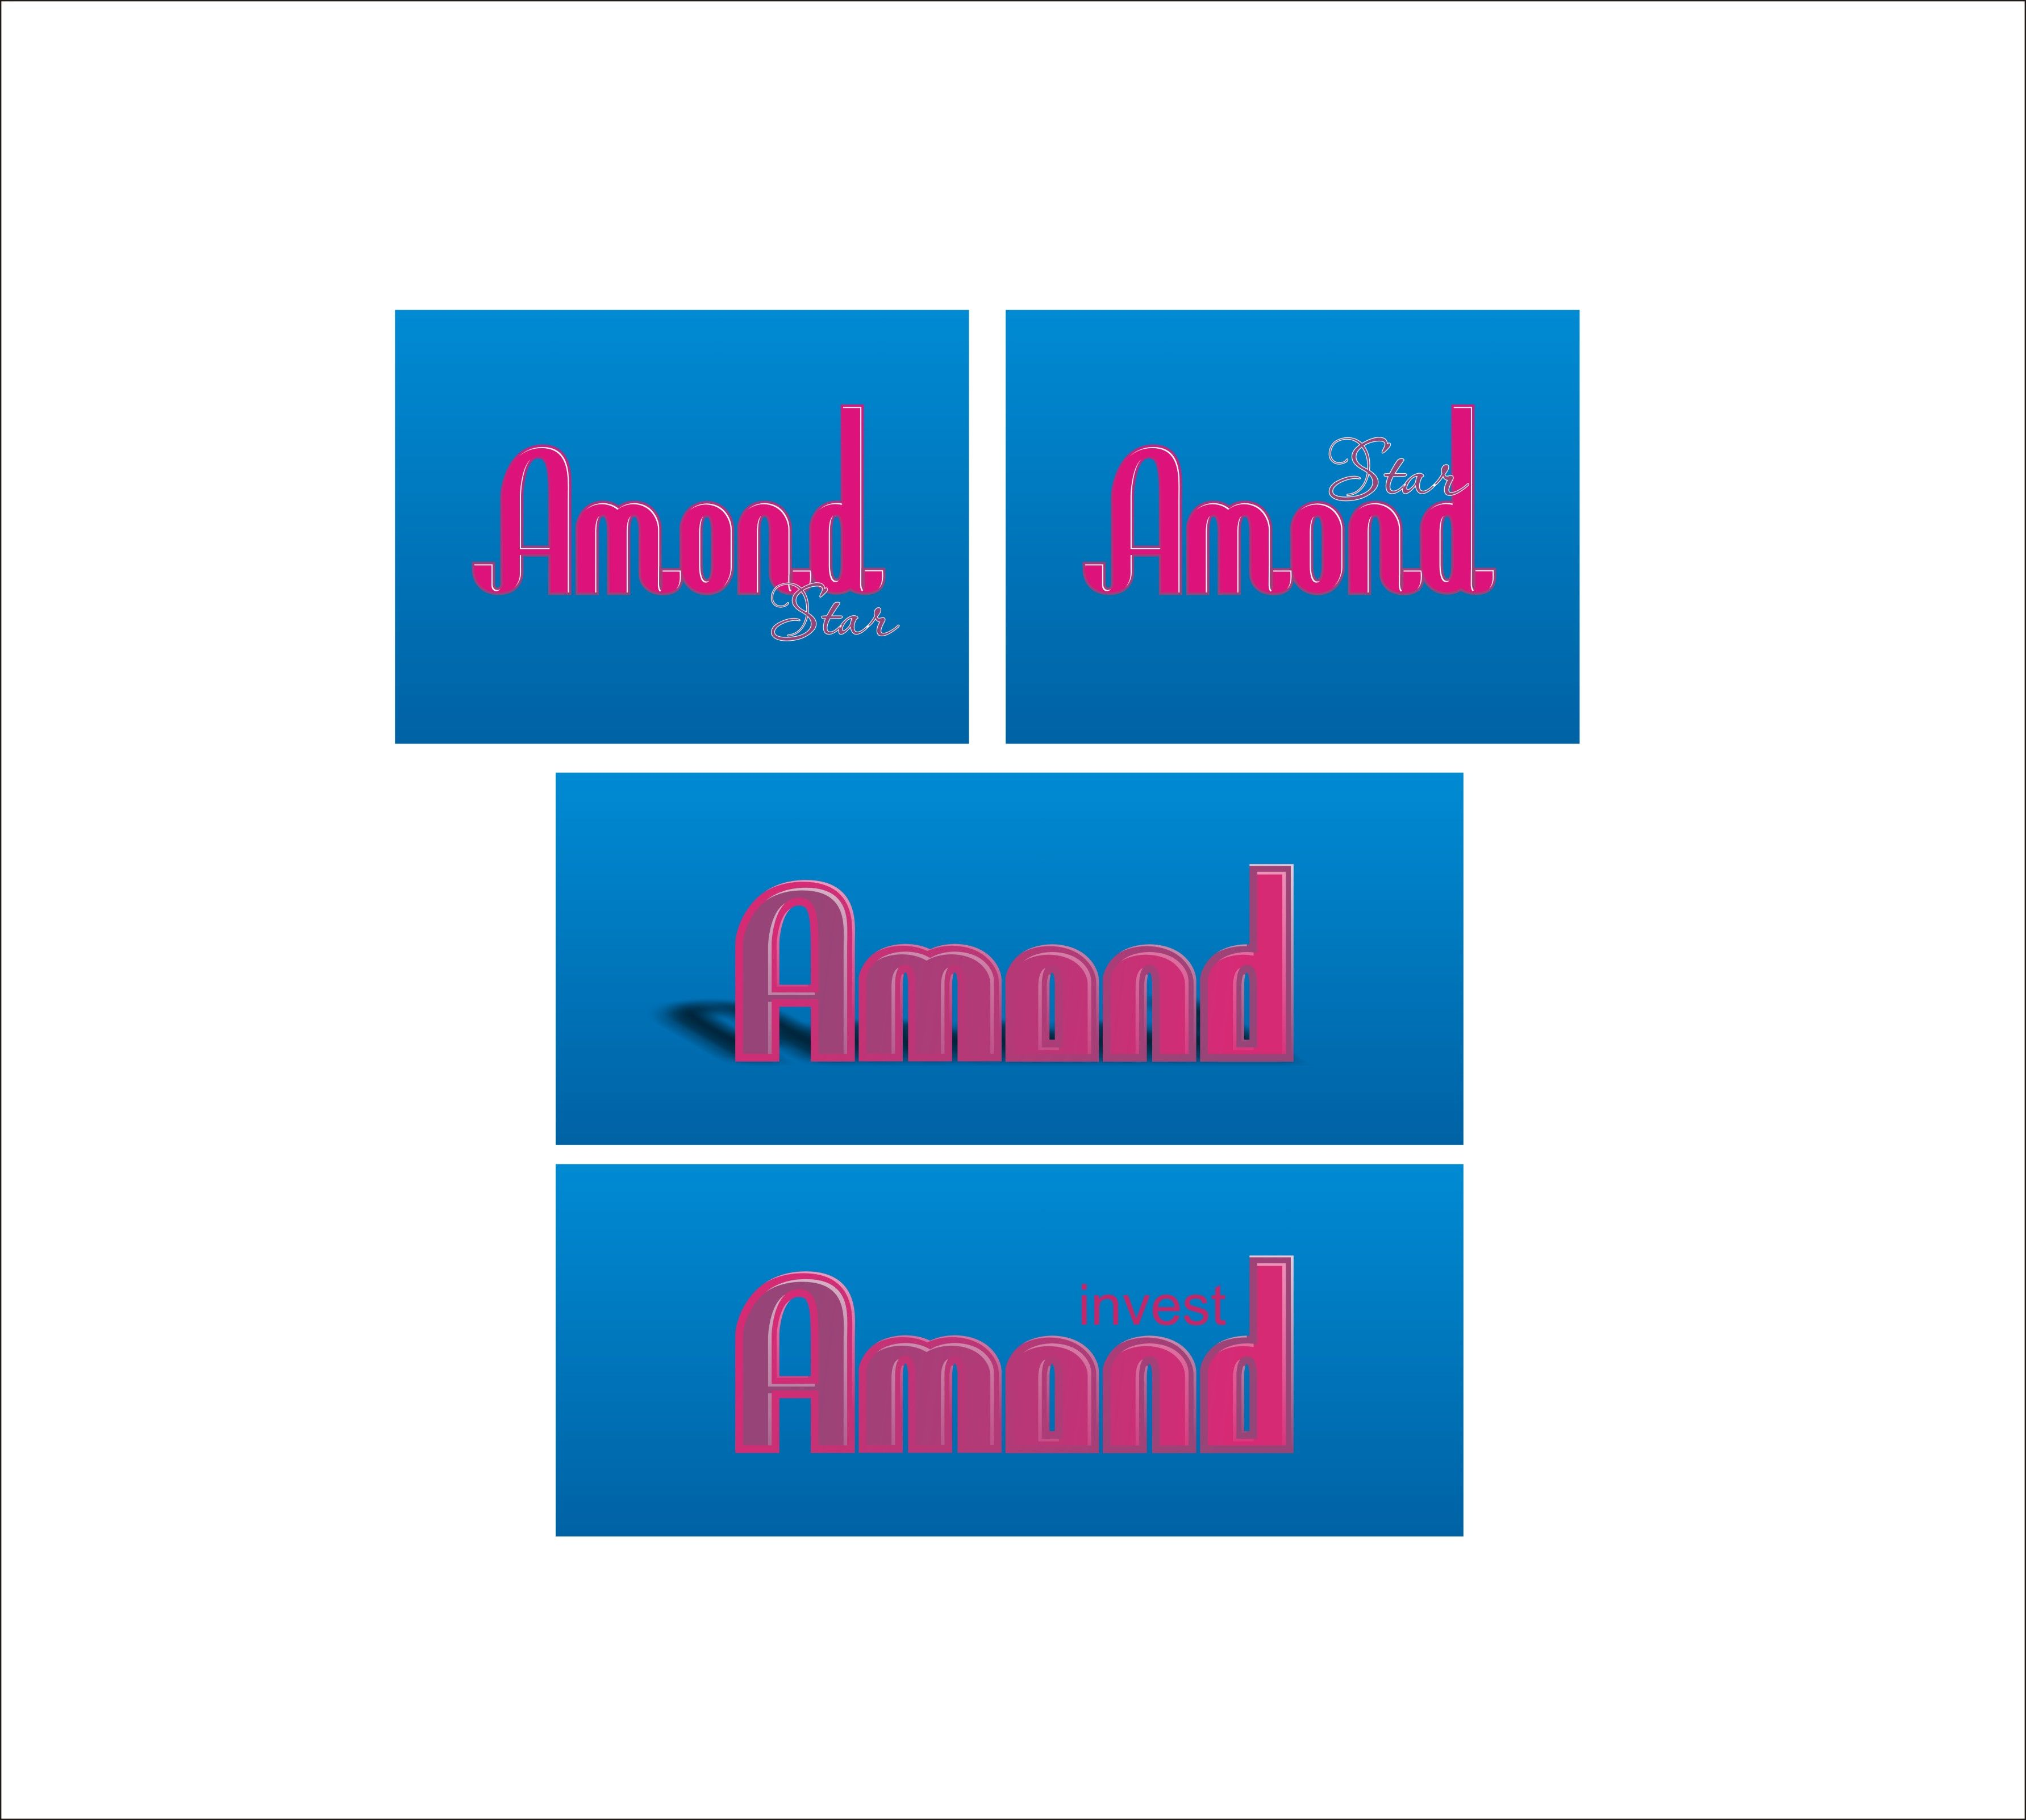 Логотип для группы компаний  - дизайнер Nedowo